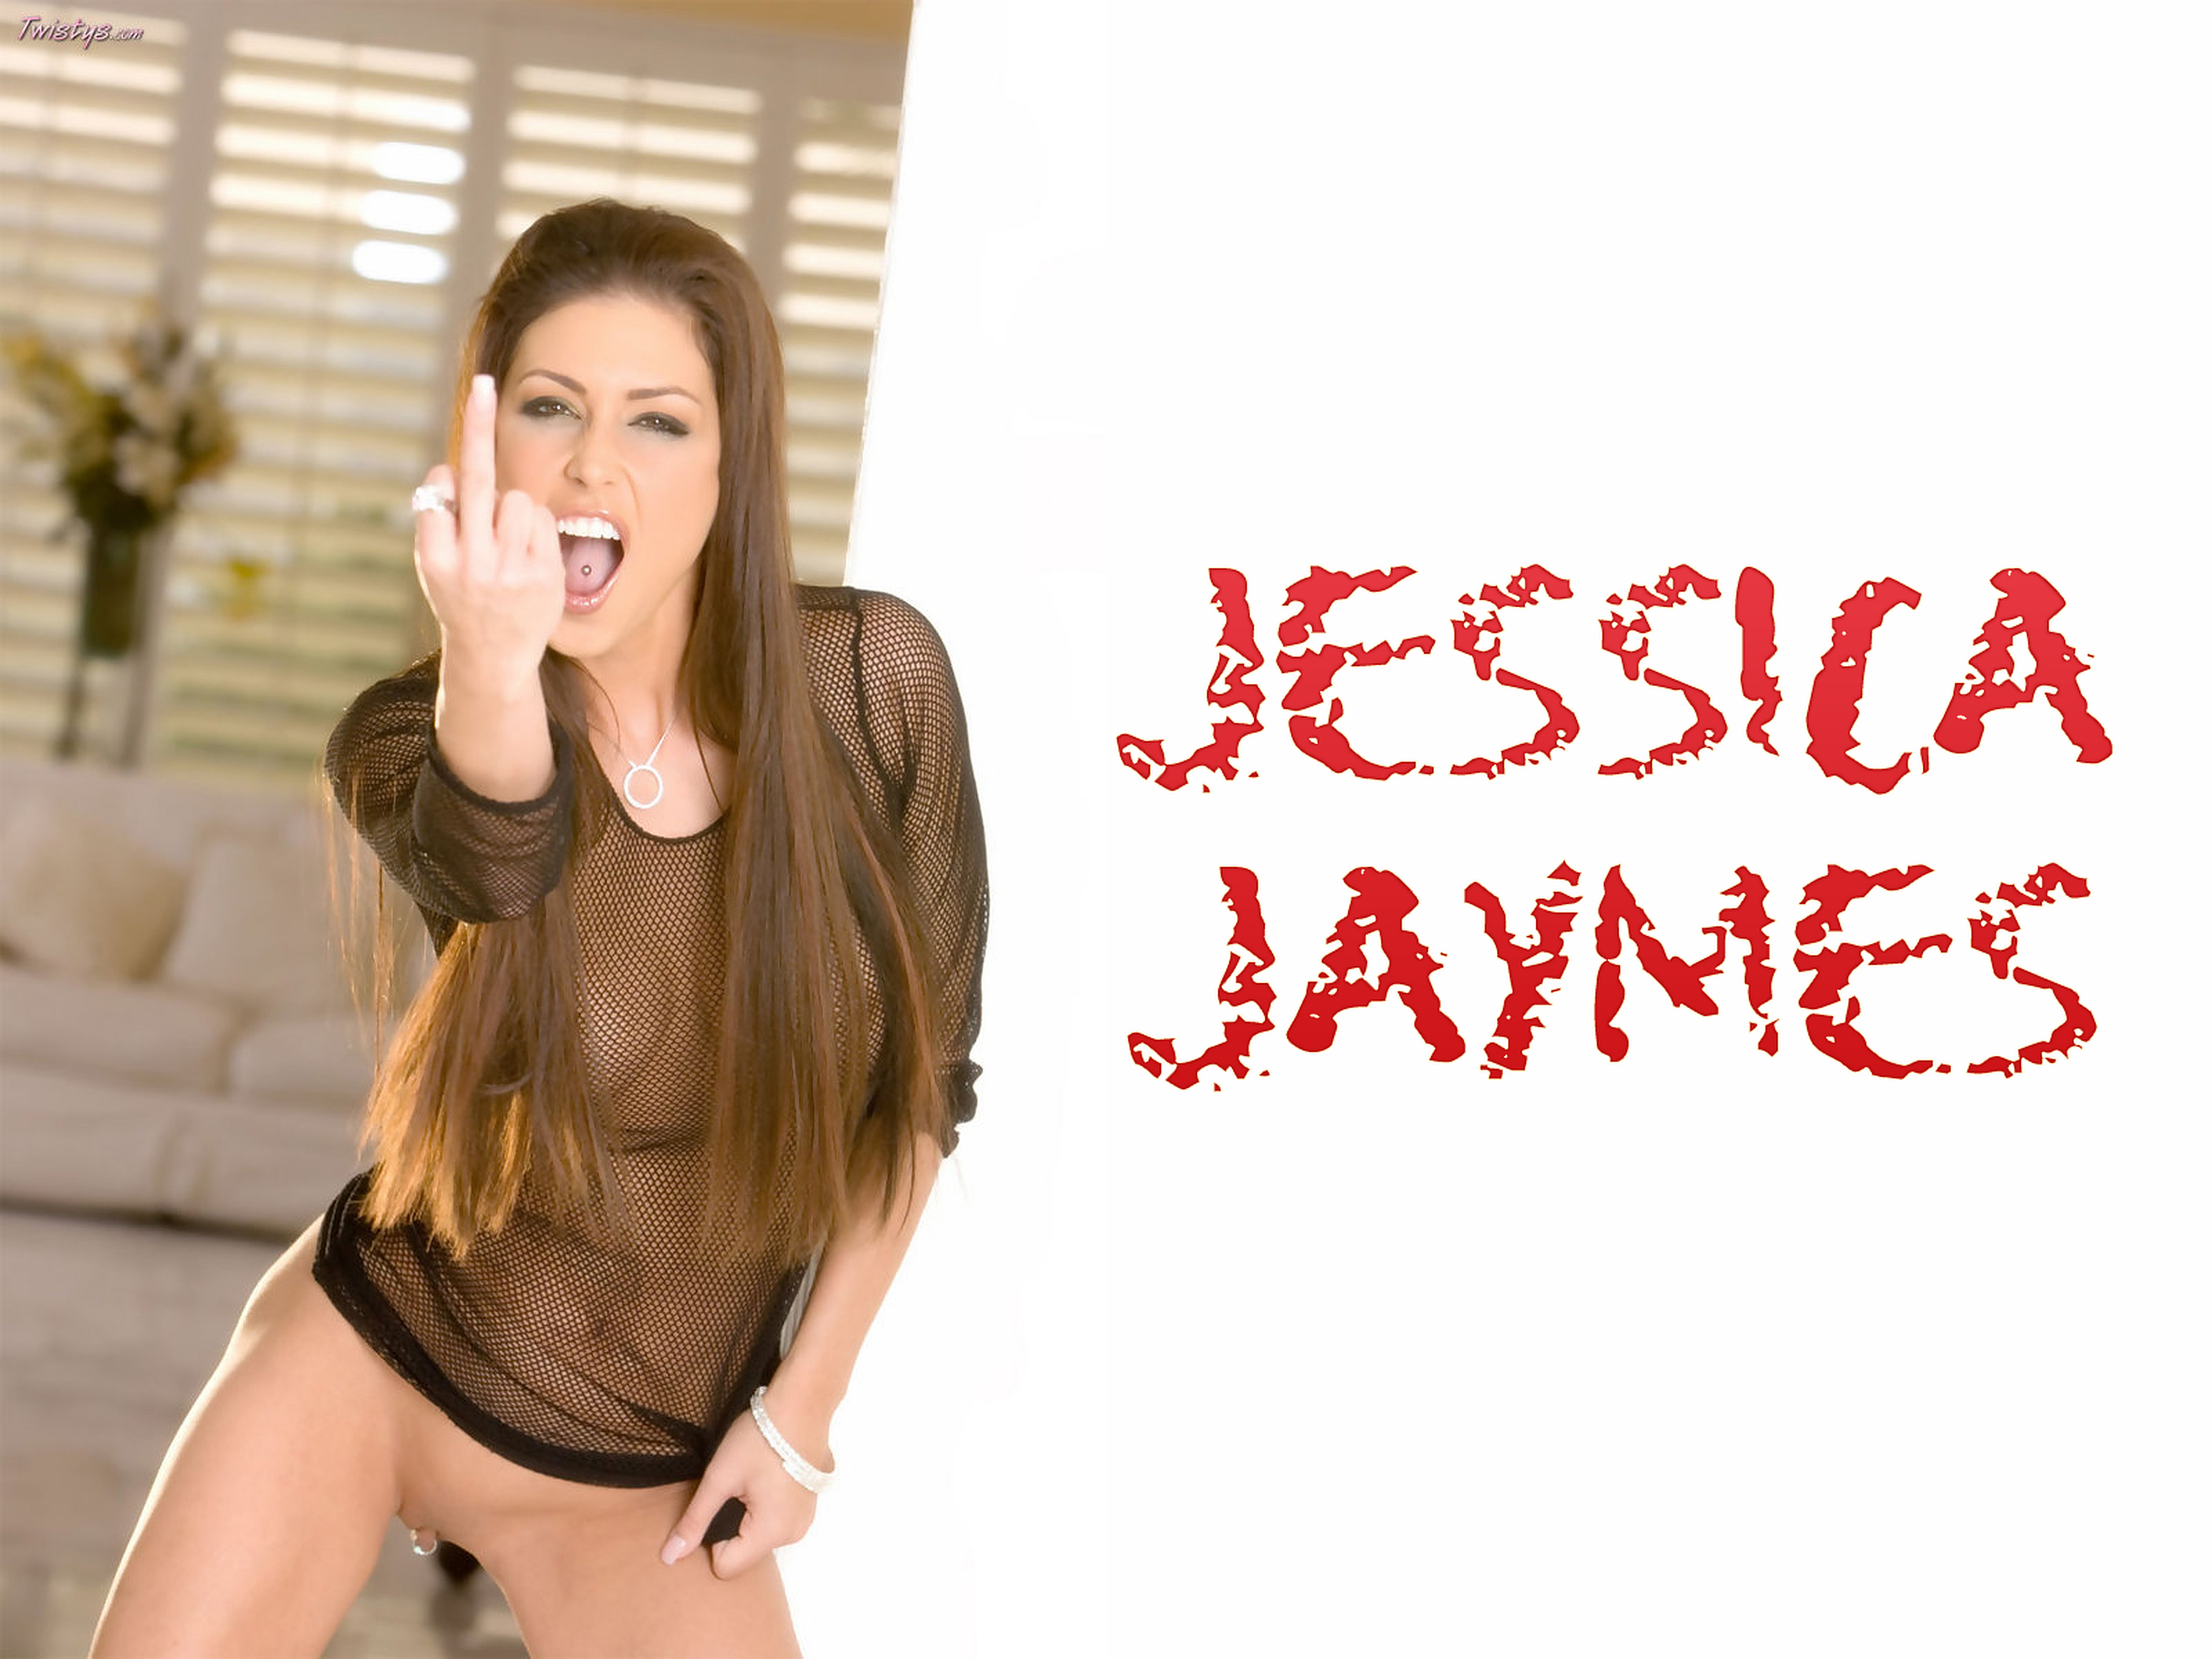 Wallpaper Jessica Jaymes, Penthouse, Penthouse Pet, Brunette, Sexy, Hot, Pornstar, Porn Star, Look, Pierced Tongue, Piercing, Pierced Cunt -7247